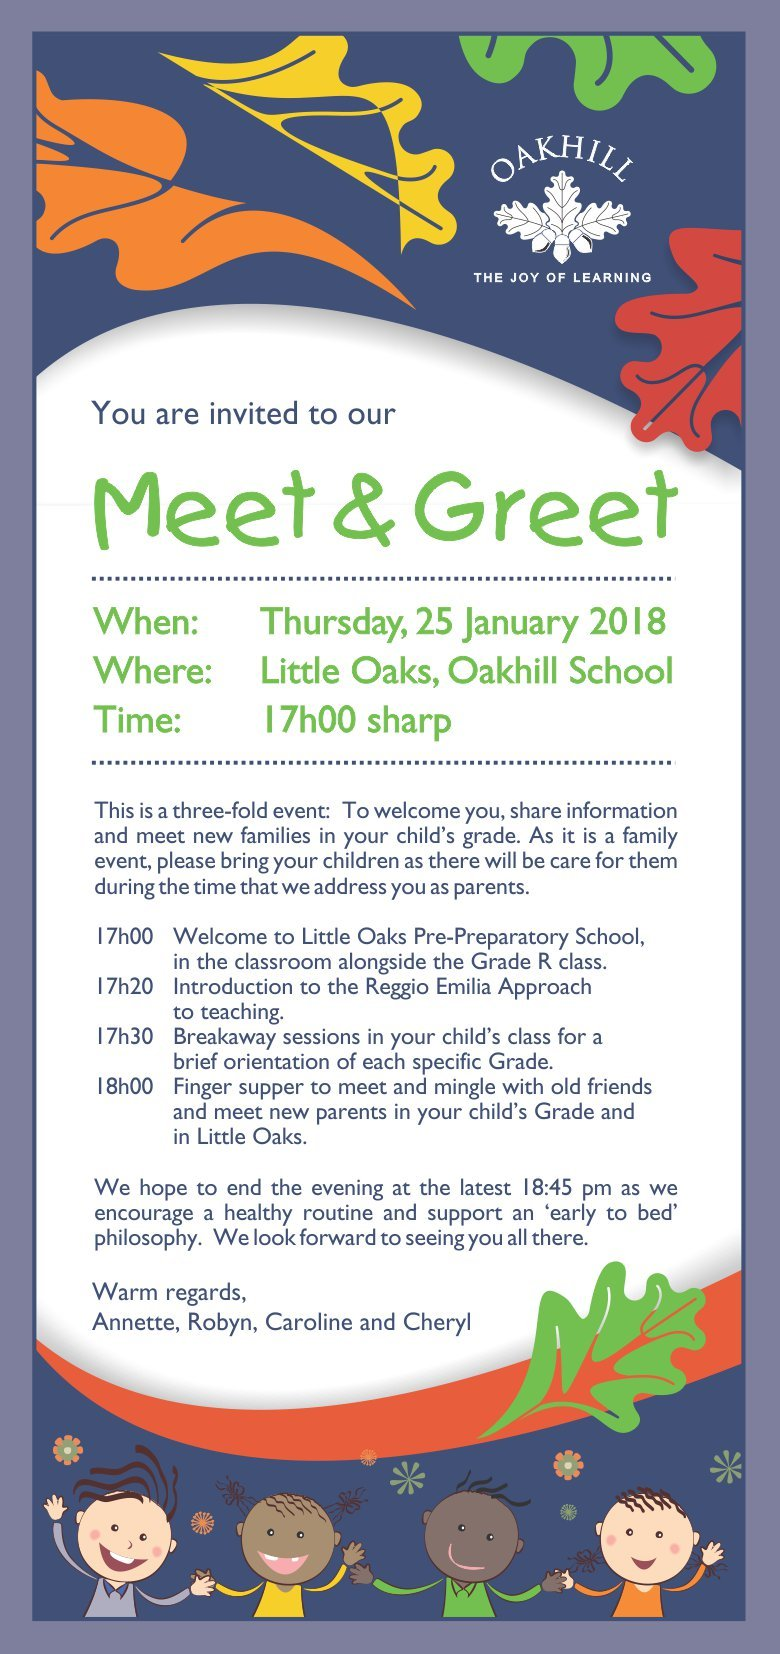 Little Oaks Meet & Greet 2018